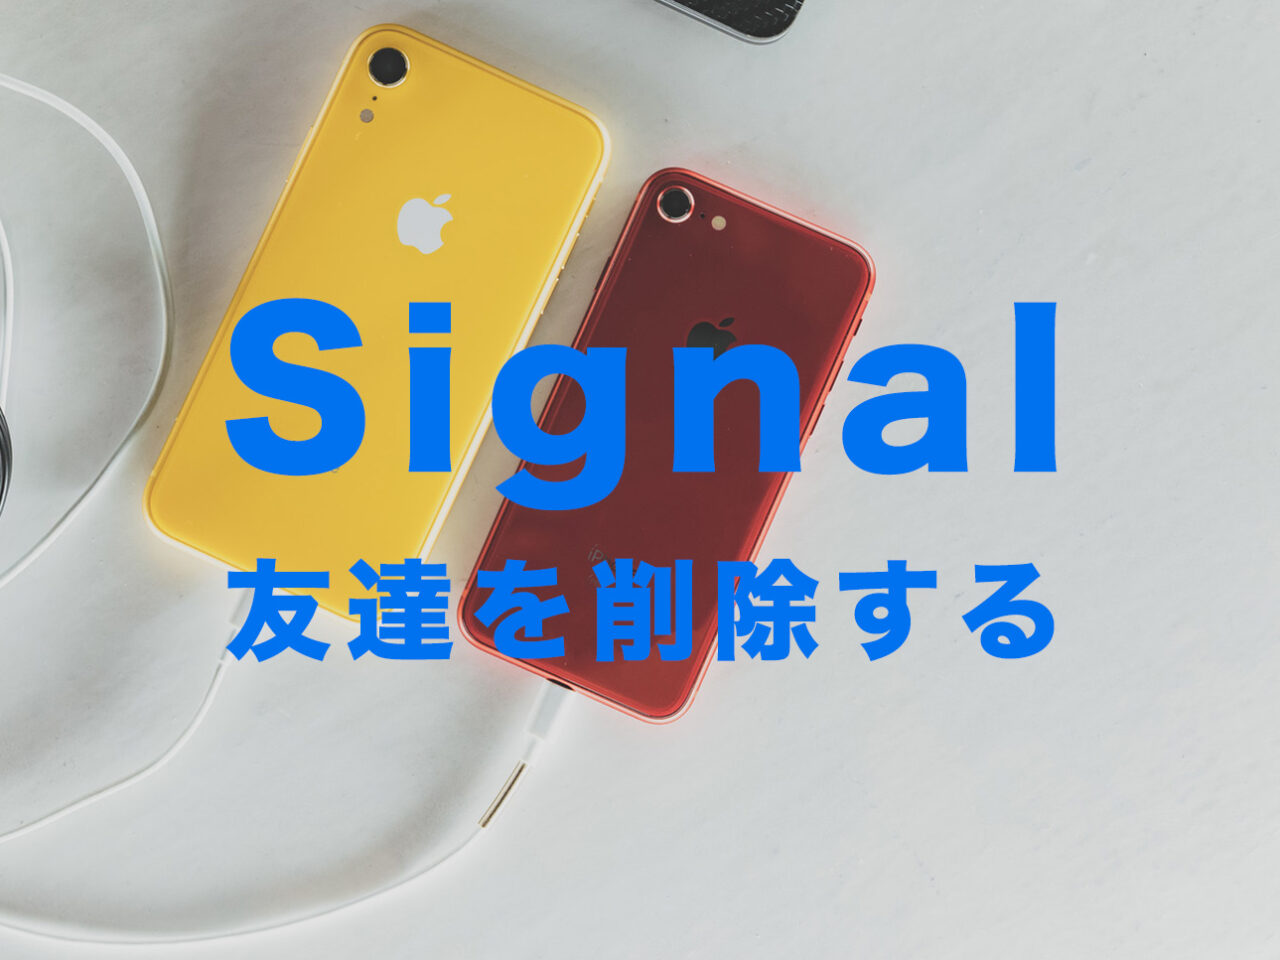 Signal(シグナル)で友達を削除する方法&やり方はある?【メッセージアプリ】のサムネイル画像